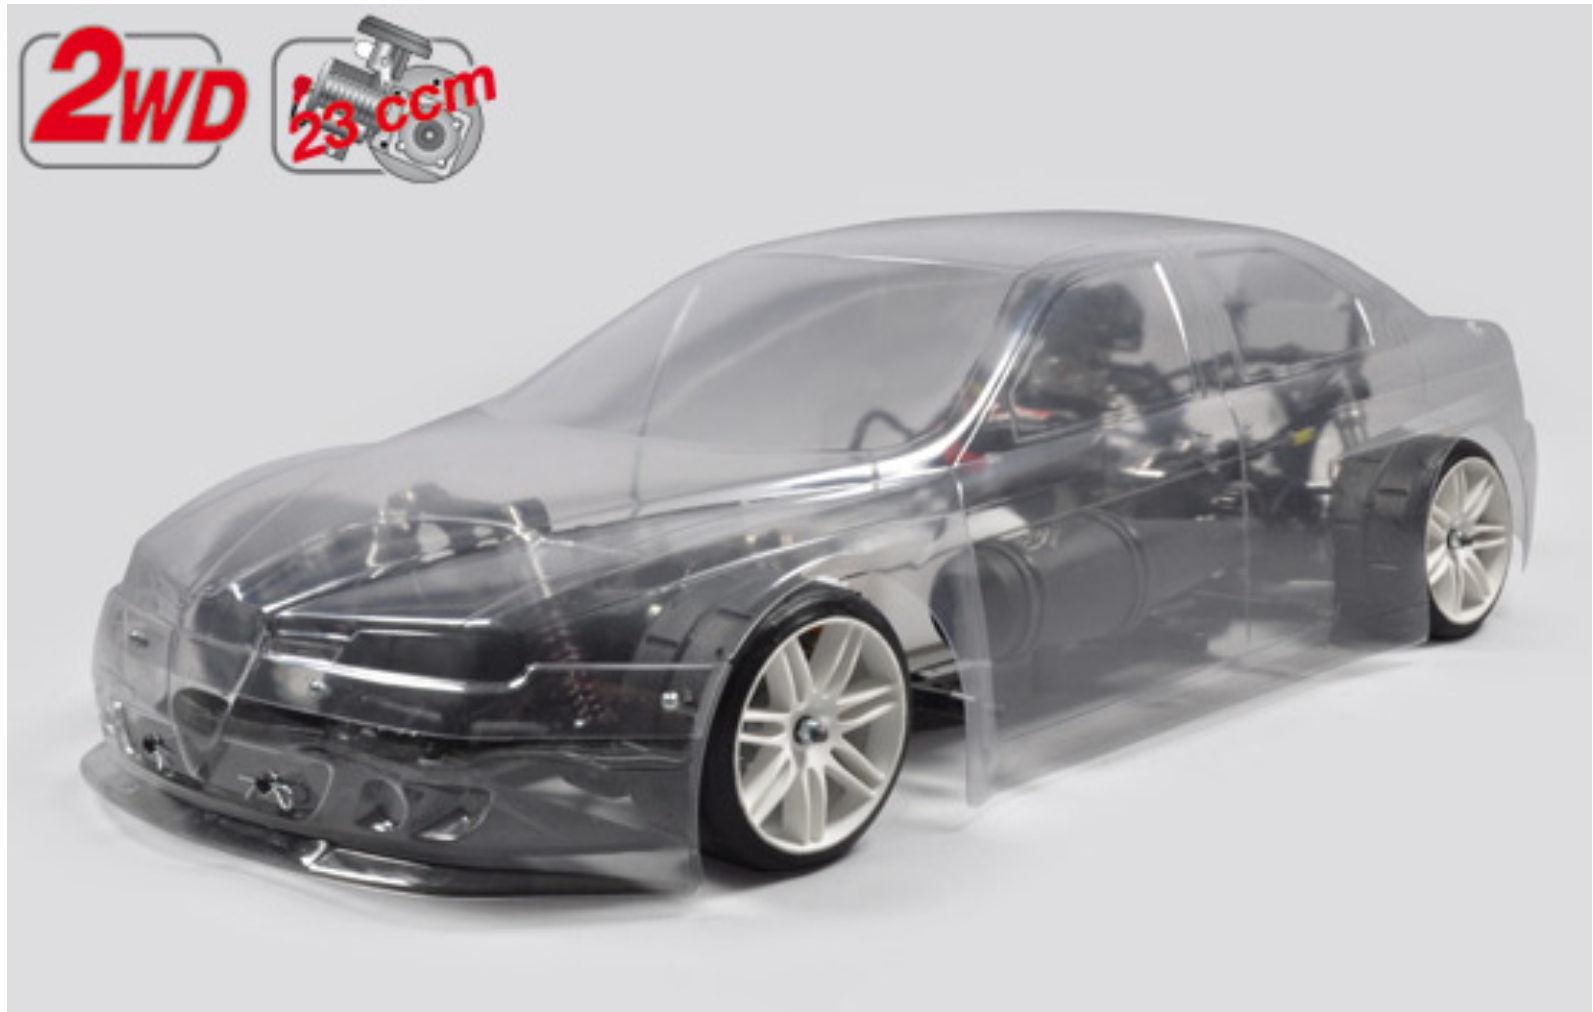 FG modelo Sport New sportline chasis 2wd + Alfa Romeo 23 ccm sin pintar